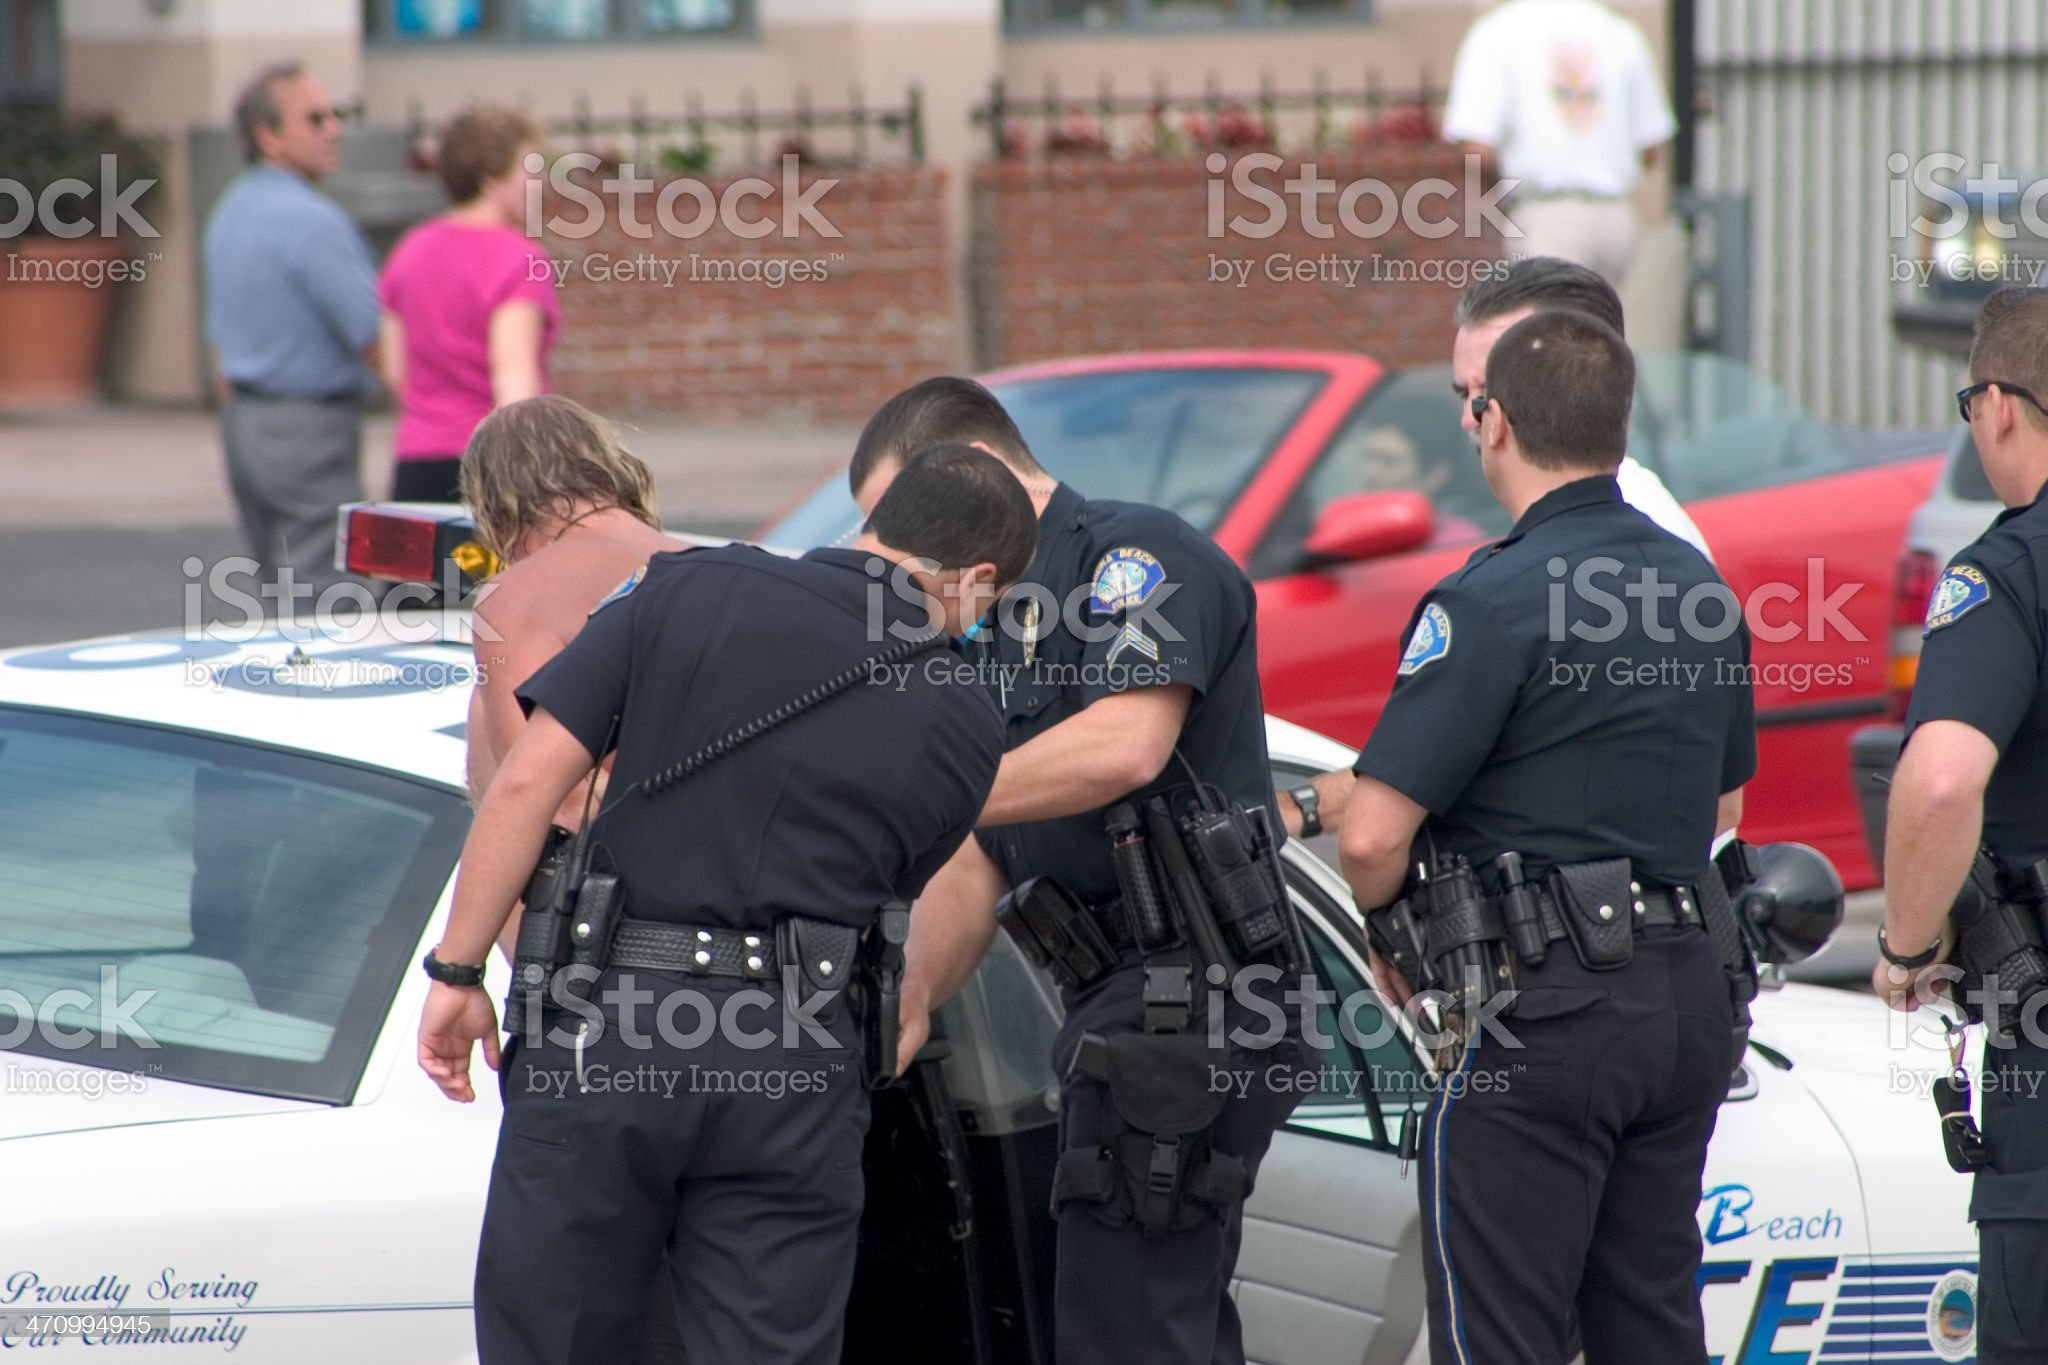 Arrest royalty-free stock photo